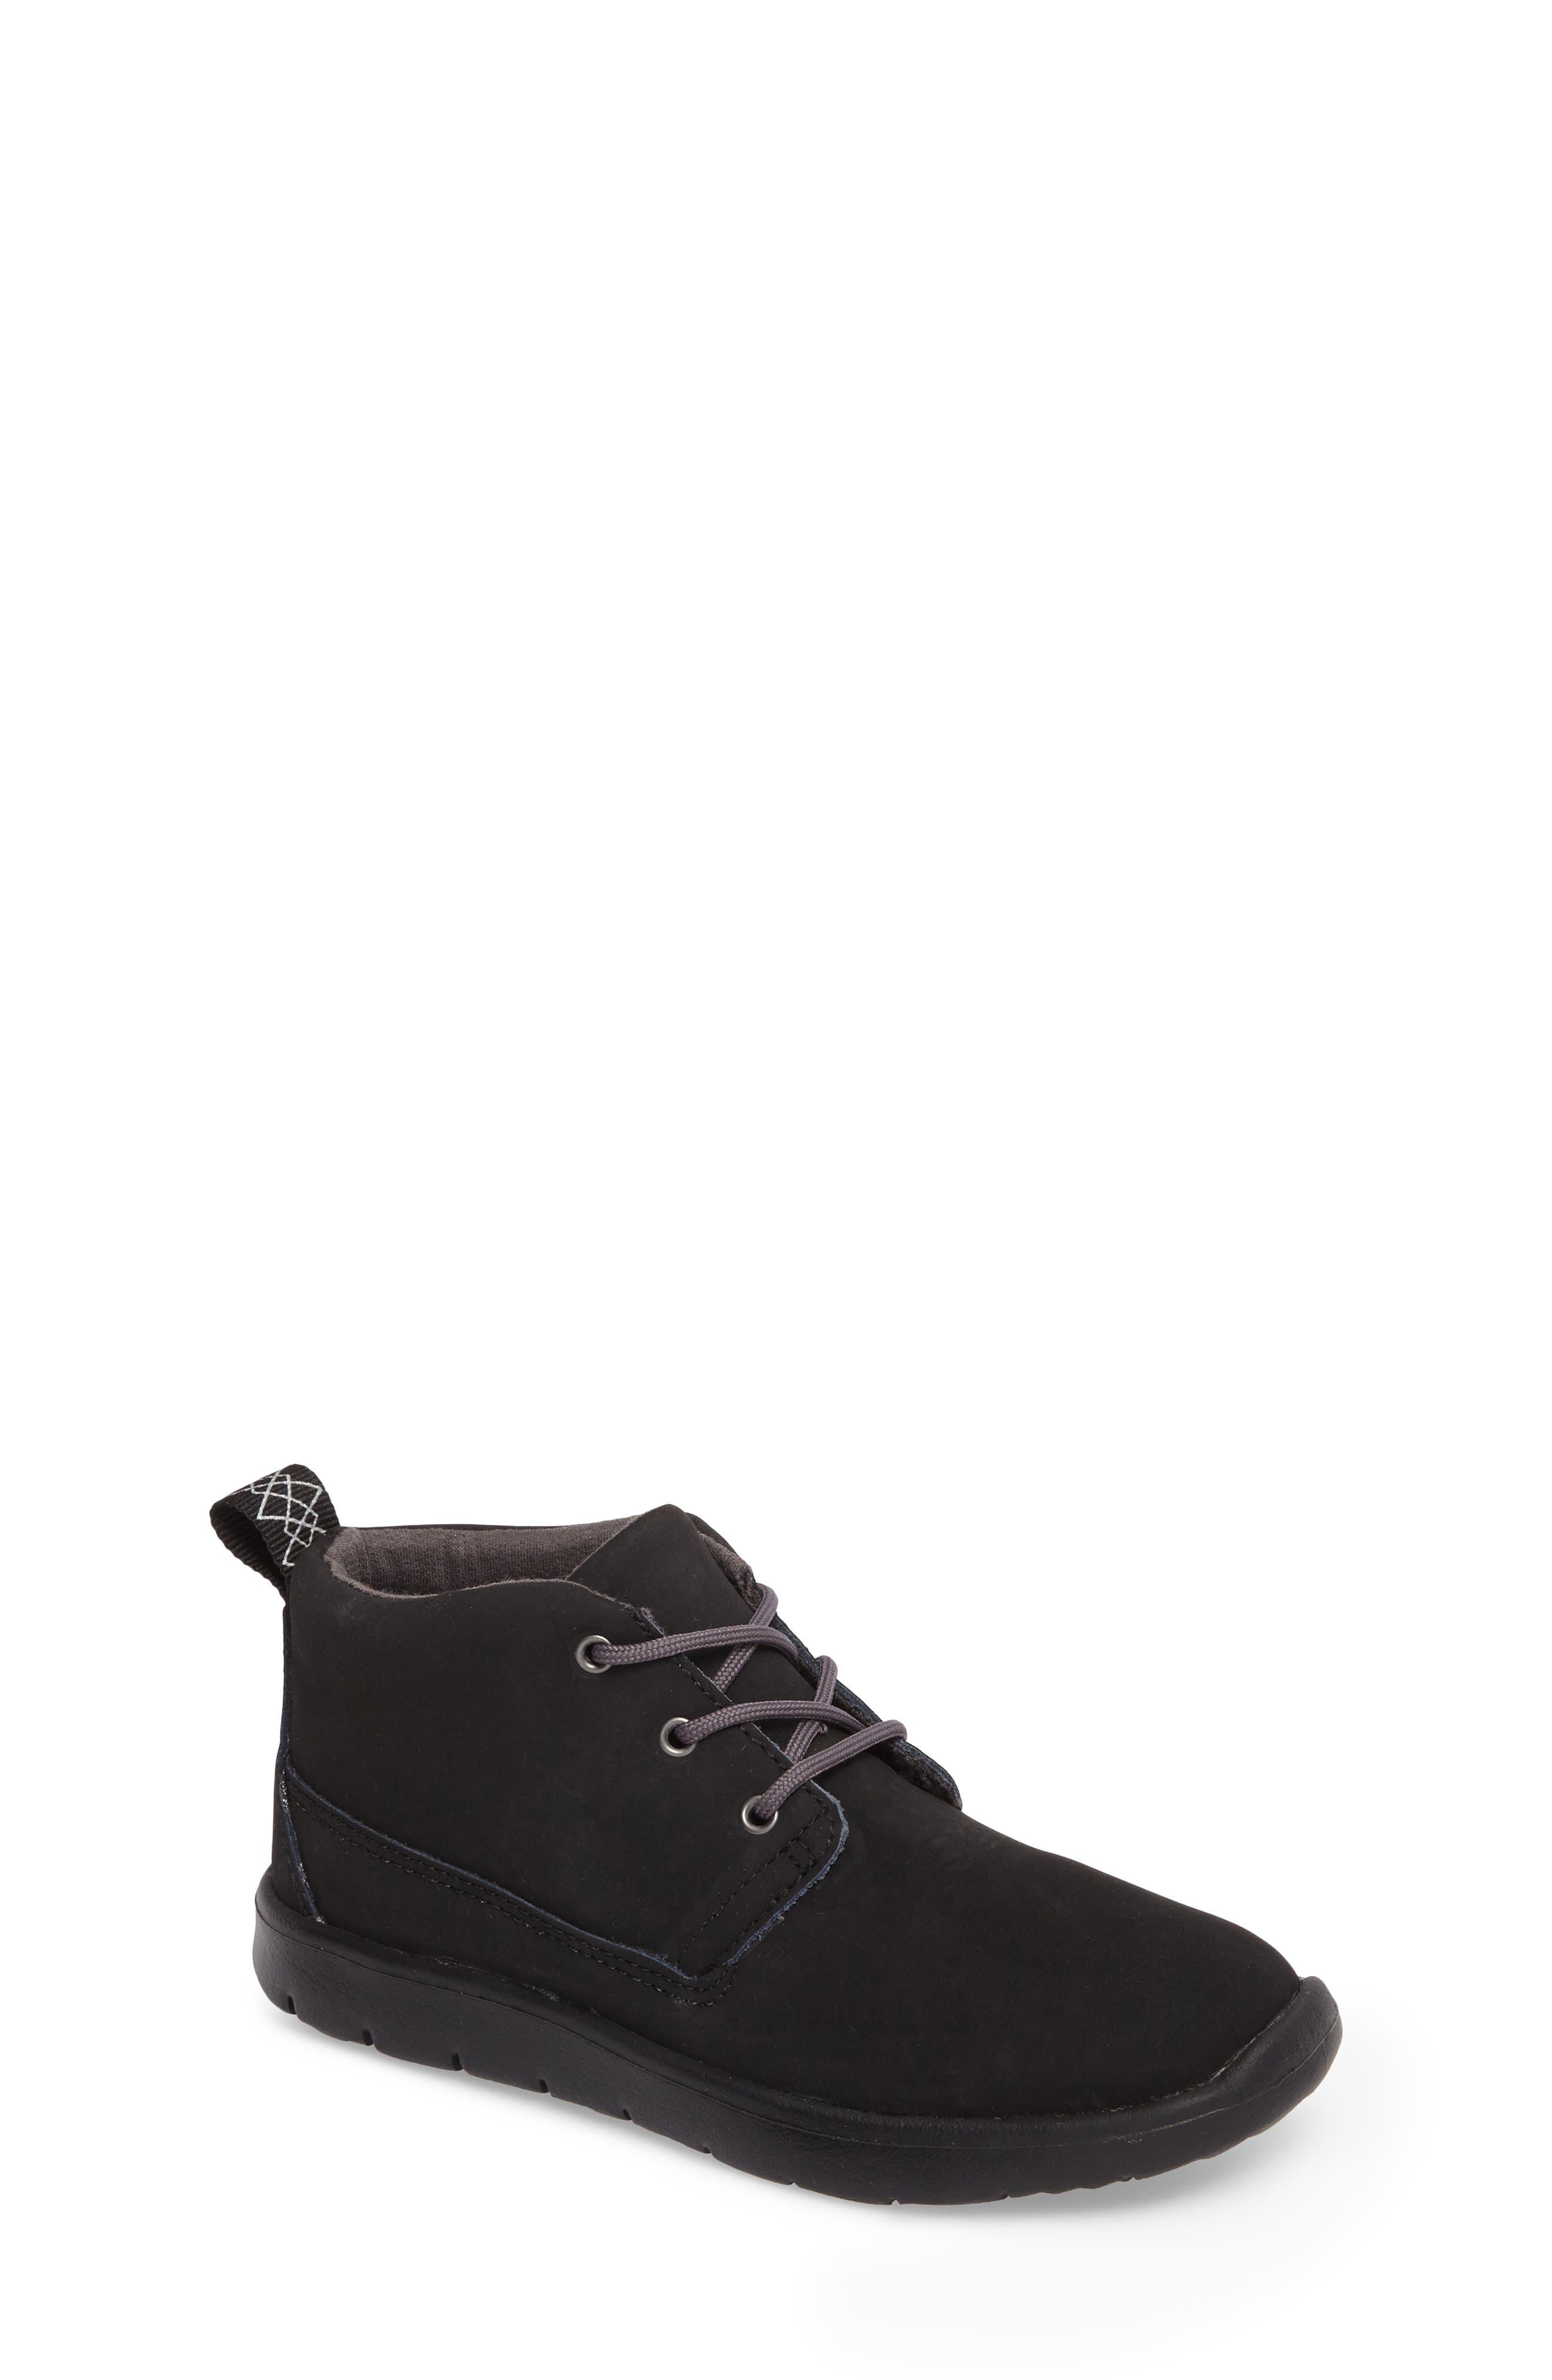 Canoe Water Resistant Chukka Sneaker,                             Main thumbnail 1, color,                             Black